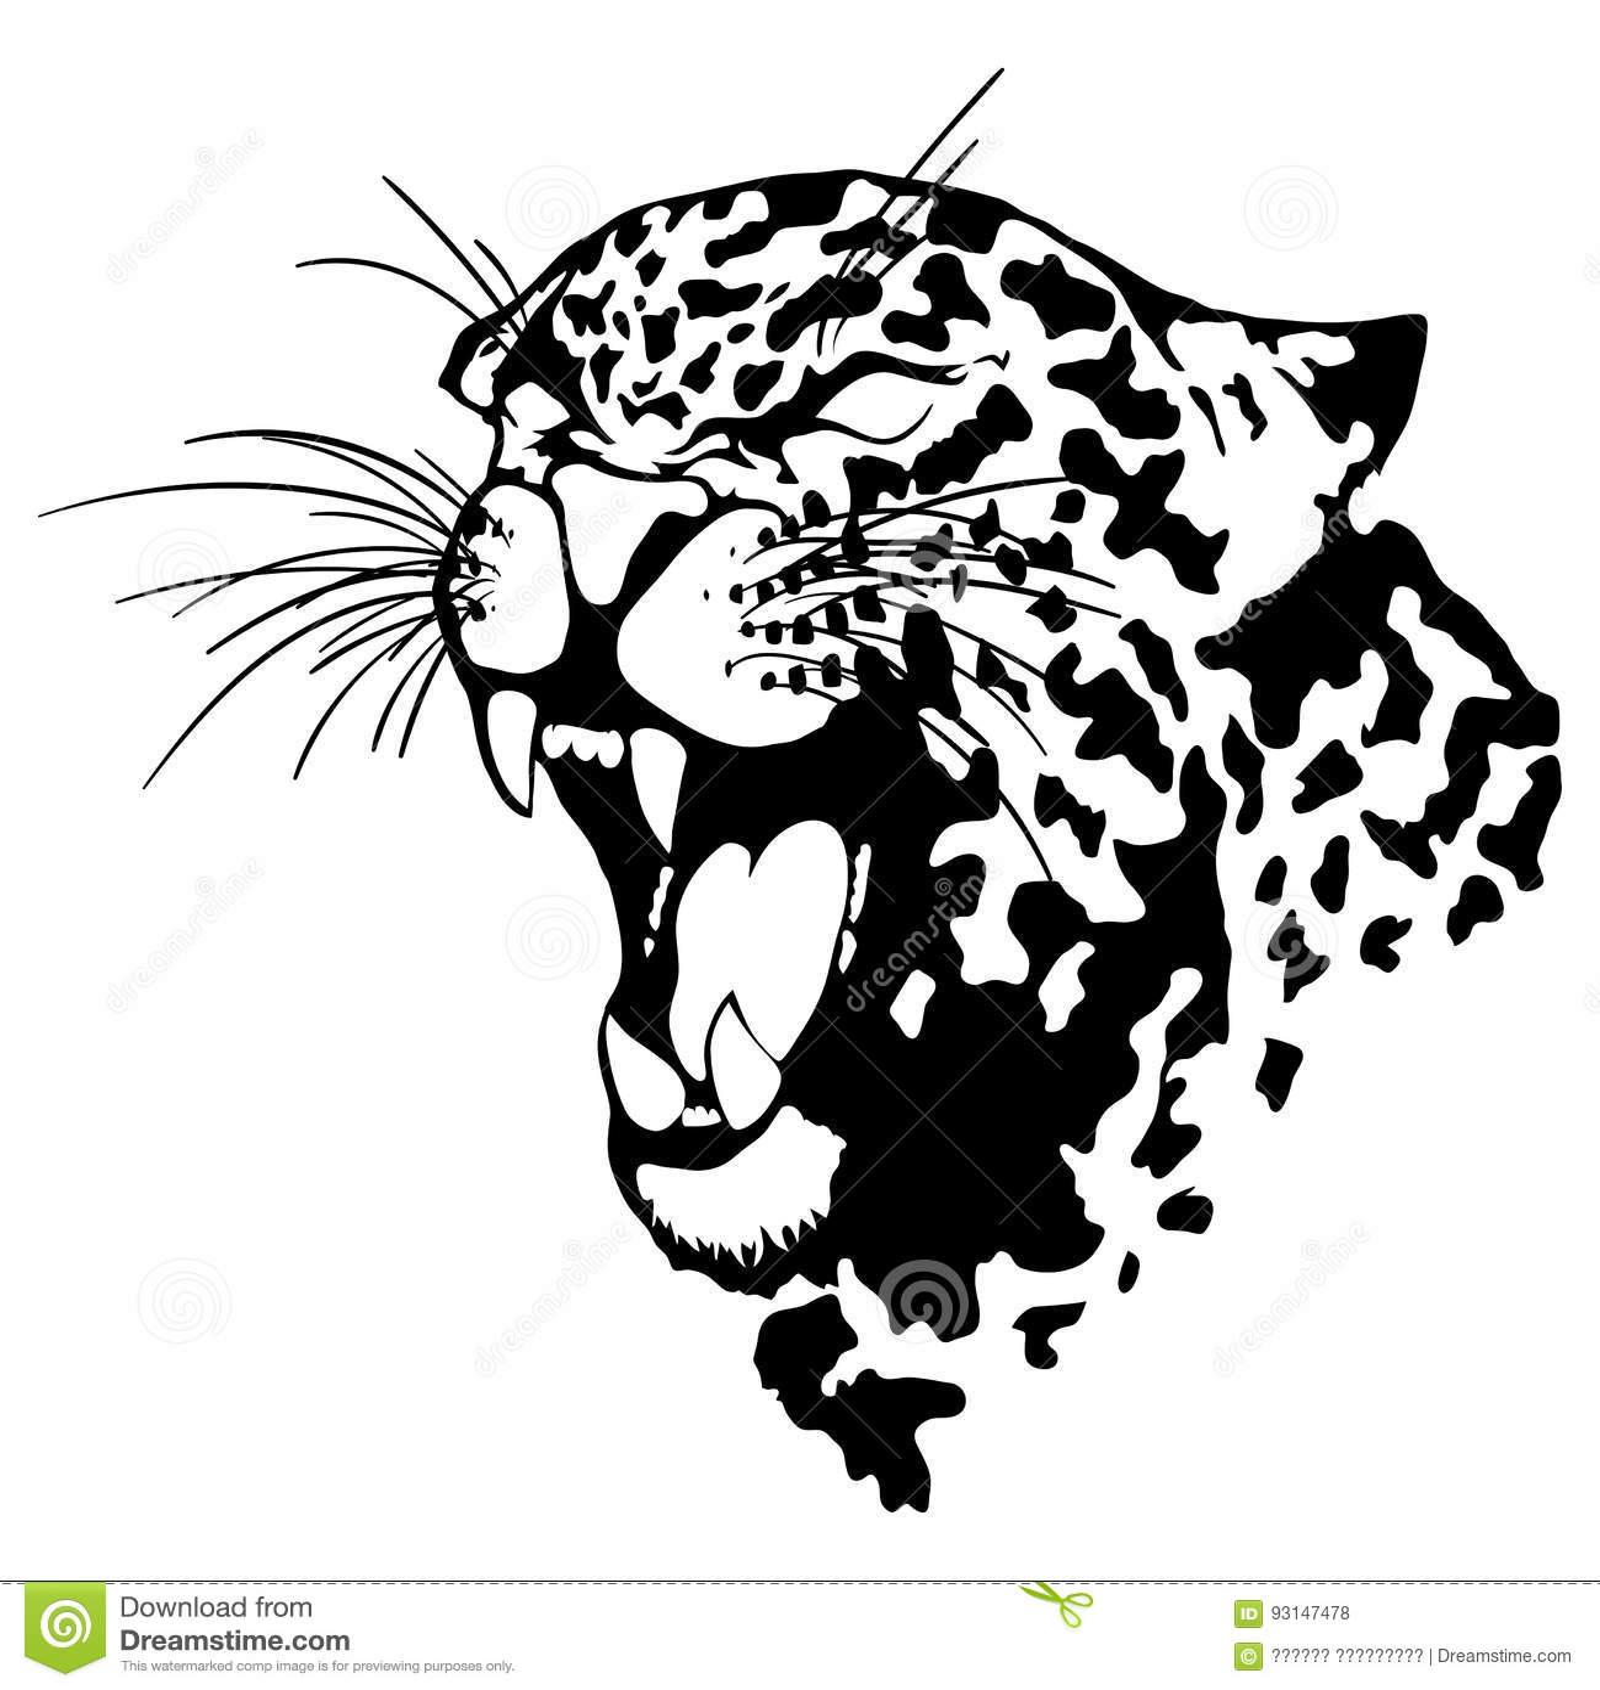 Drawn Jaguar Jaguar Head - Auto Electrical Wiring Diagram on